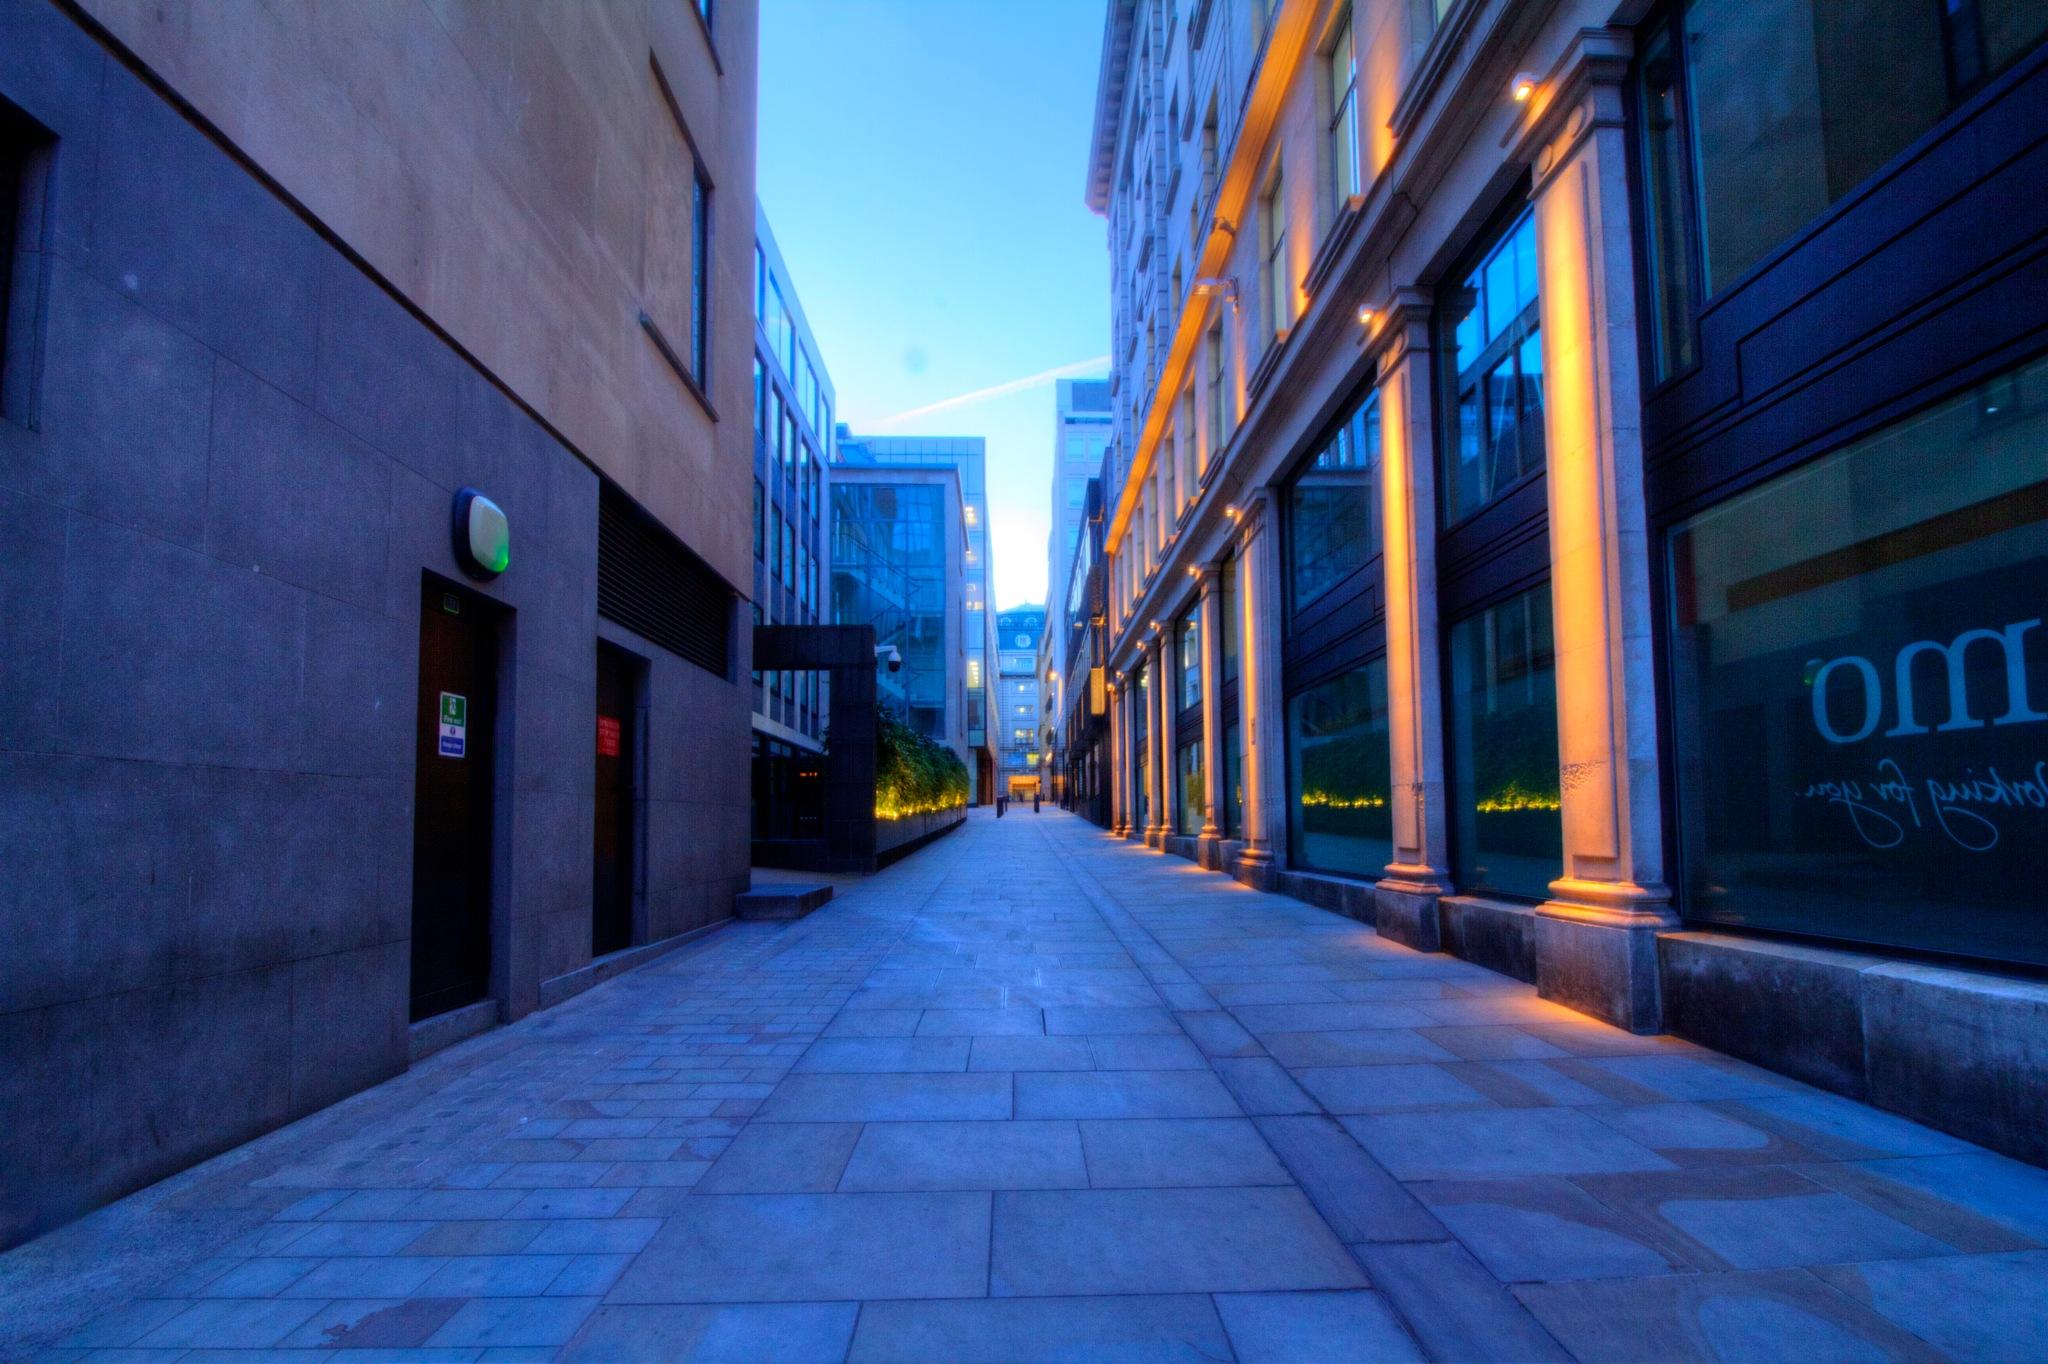 london street by Jason Lavine